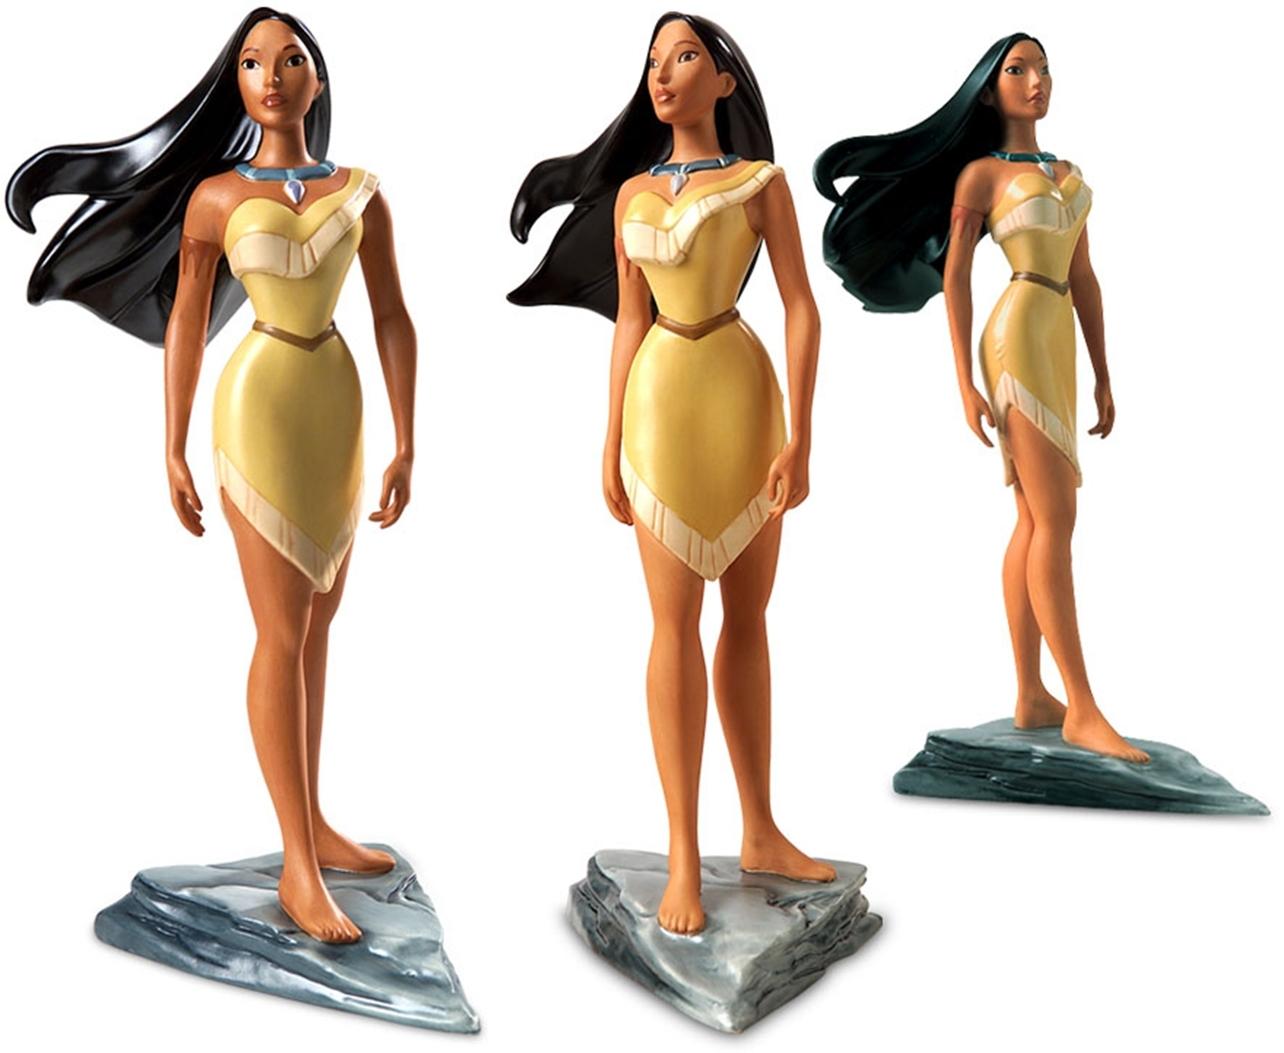 Pocahontas - Page 13 Walt-Disney-Figurines-Pocahontas-walt-disney-characters-26119424-1284-1053